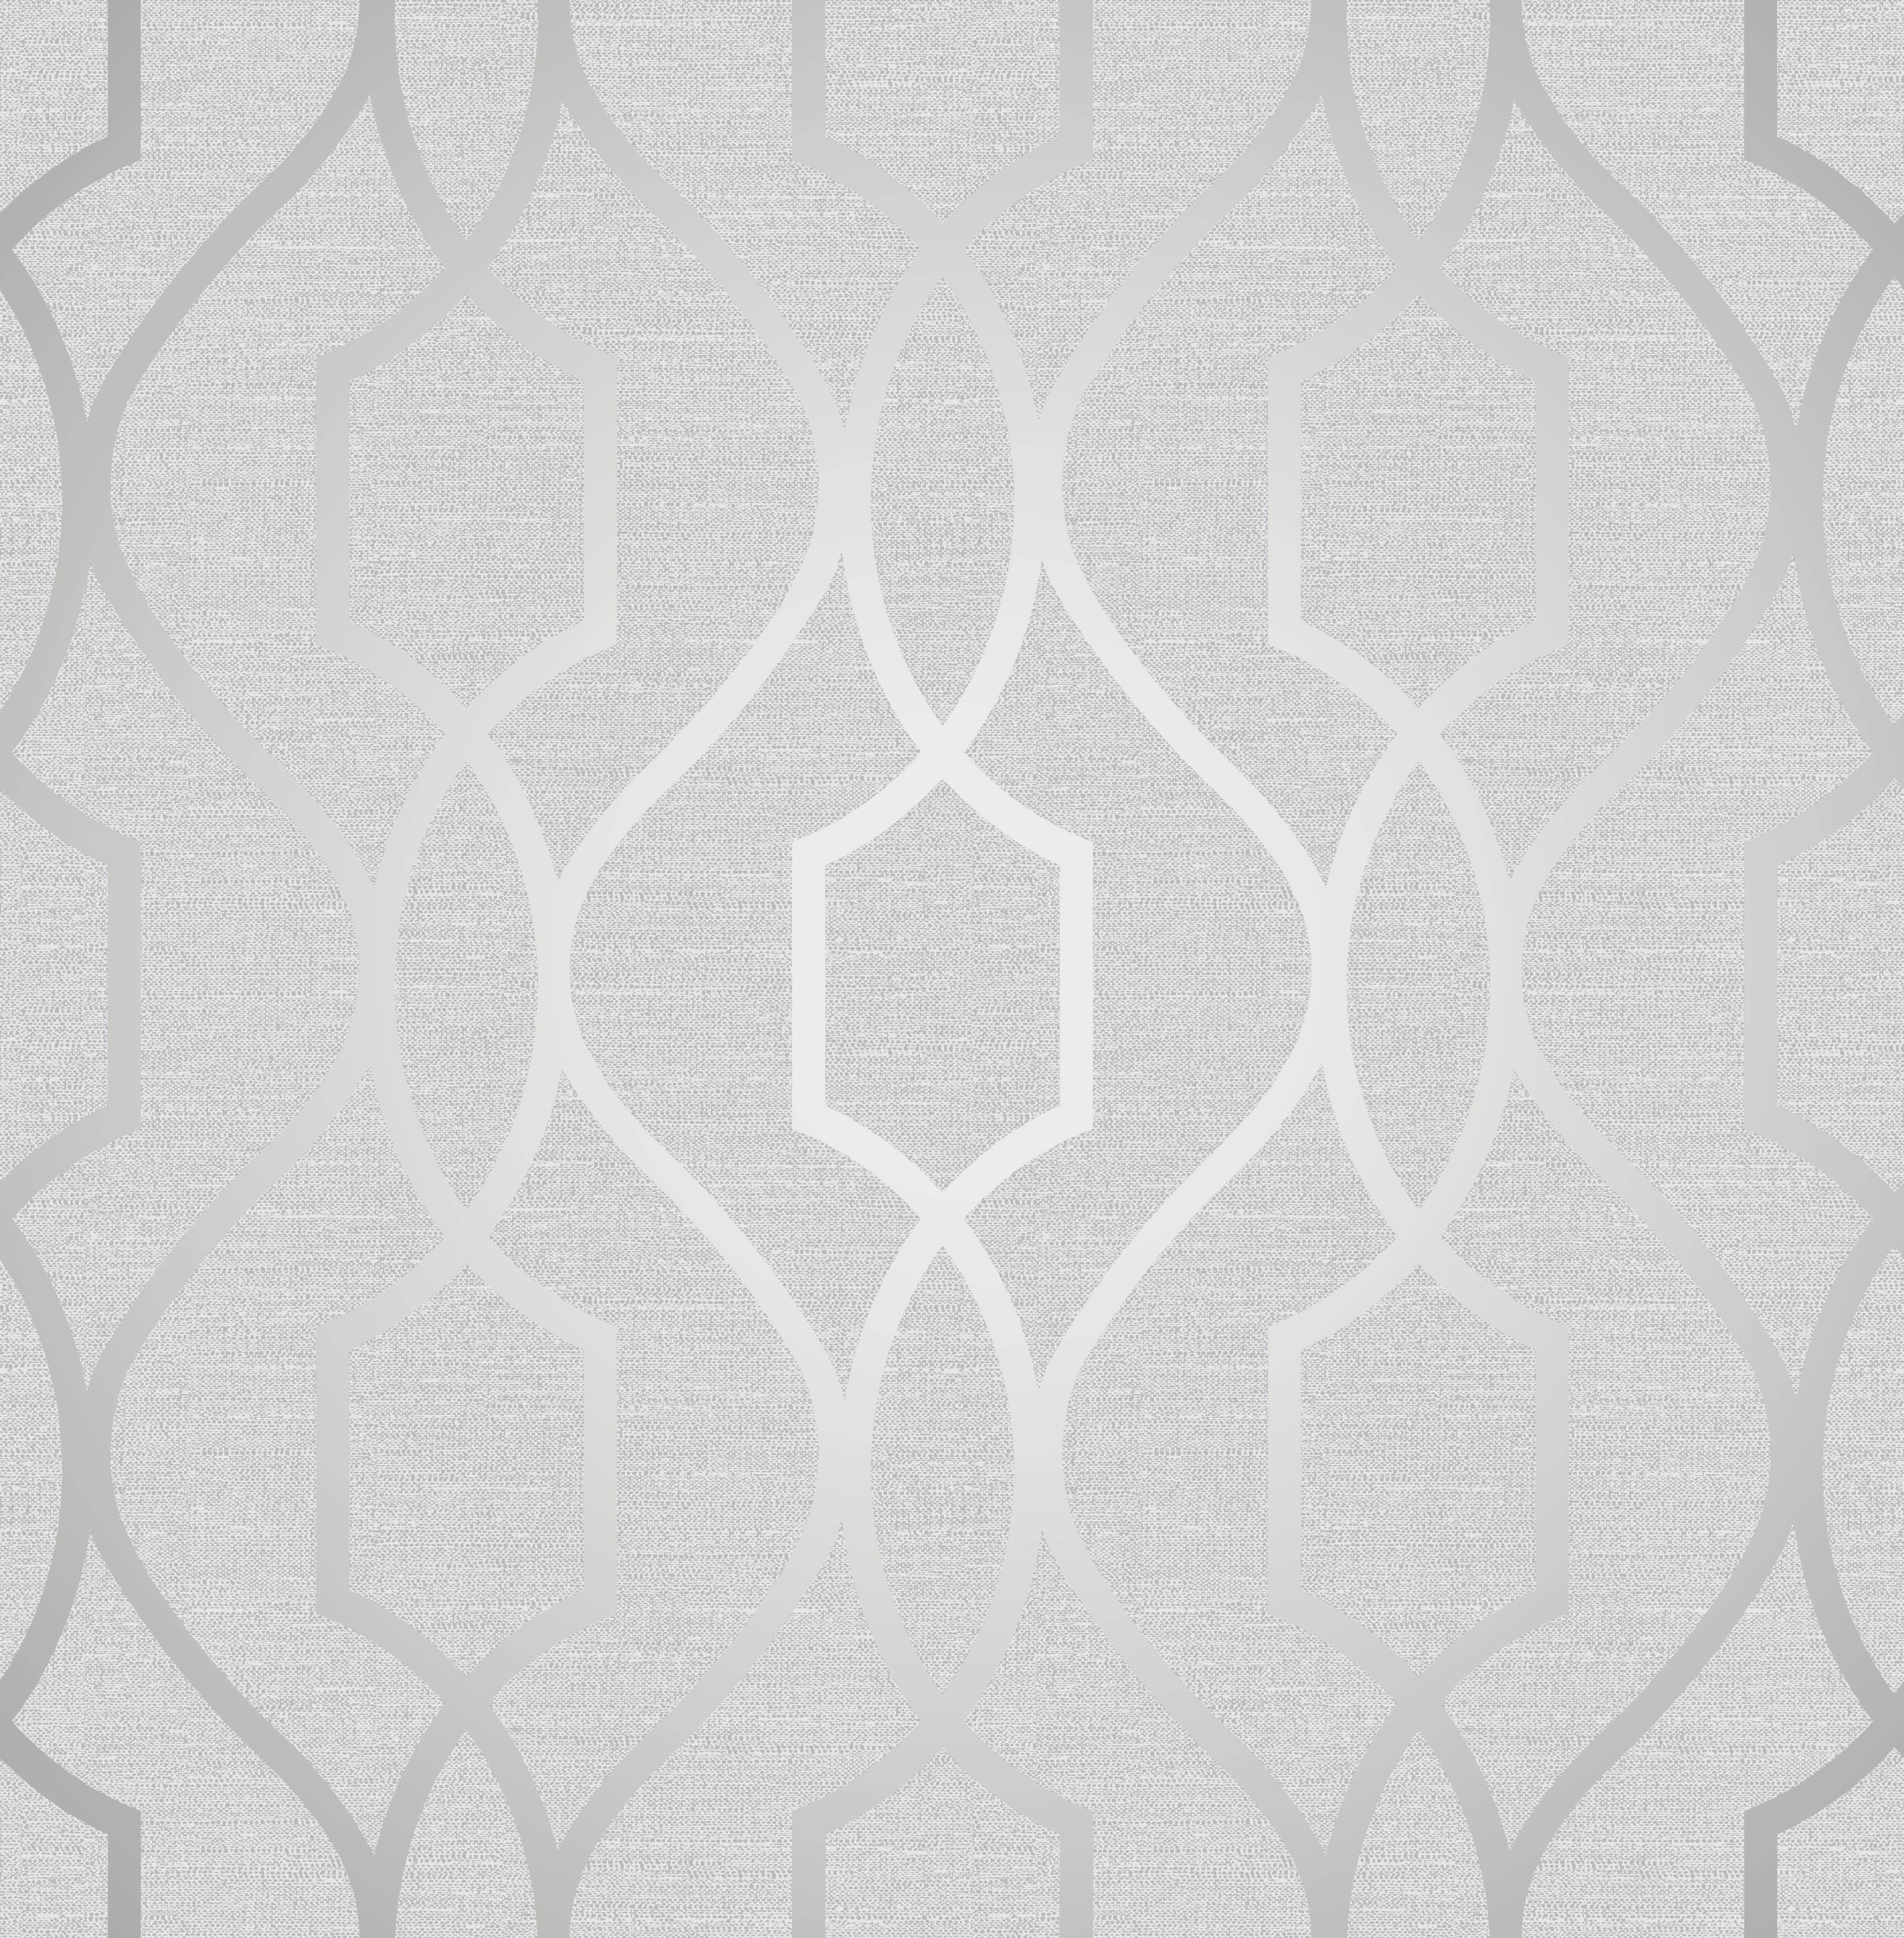 geometric wallpaper metallic shiny silver stone apex d modern  - geometric wallpaper metallic shiny silver stone apex d modern fine decor